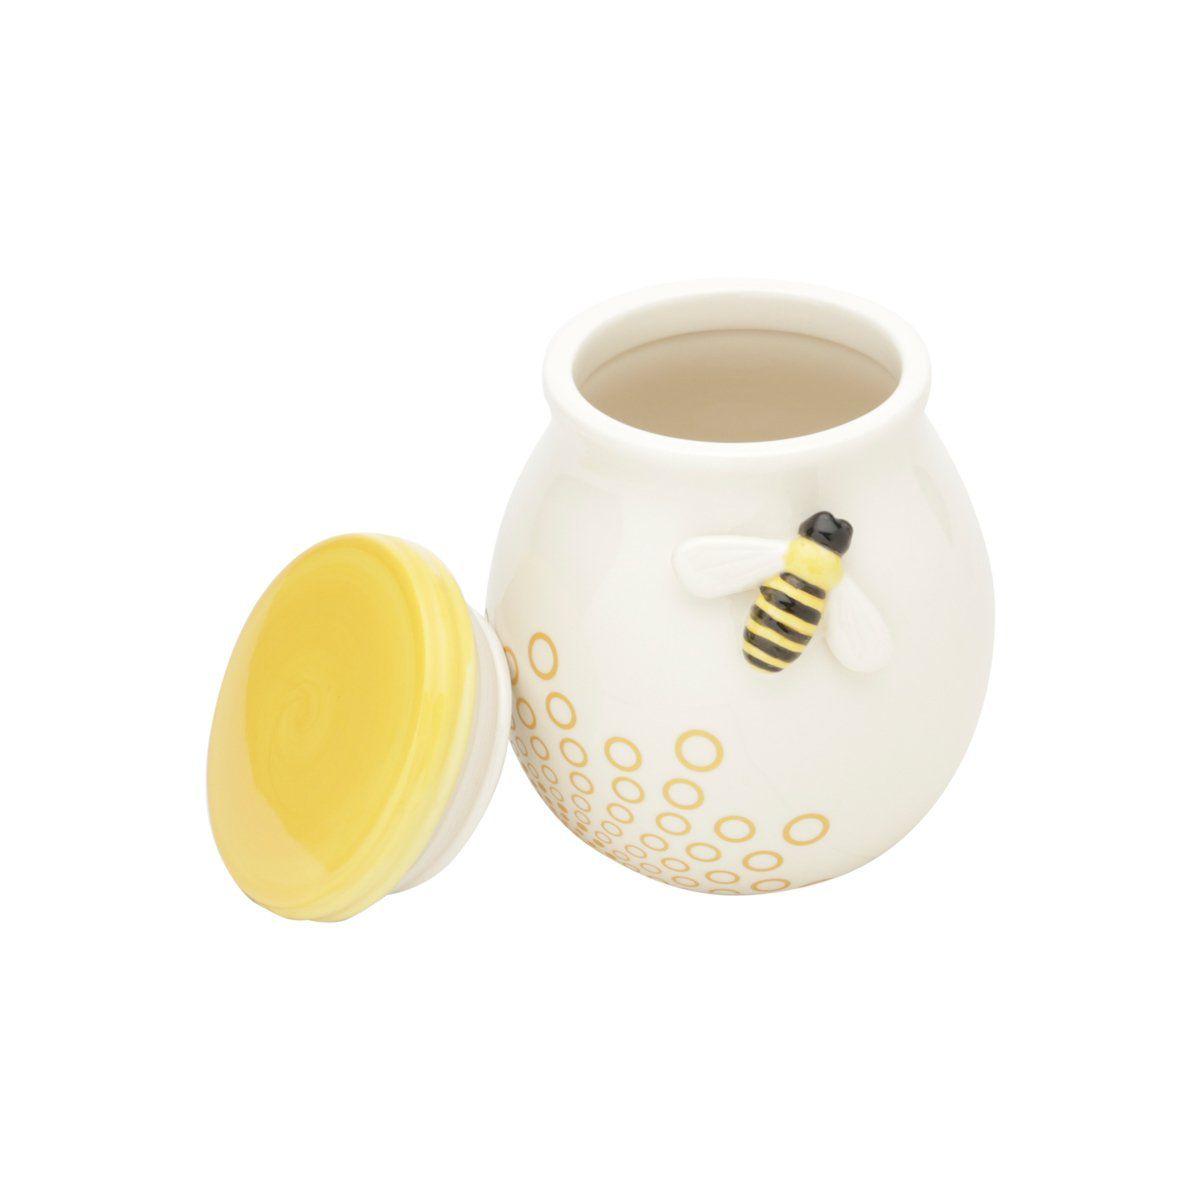 Pote decorativo 12,9 cm de cerâmica branca e amarela Abelha Lyor - L64018